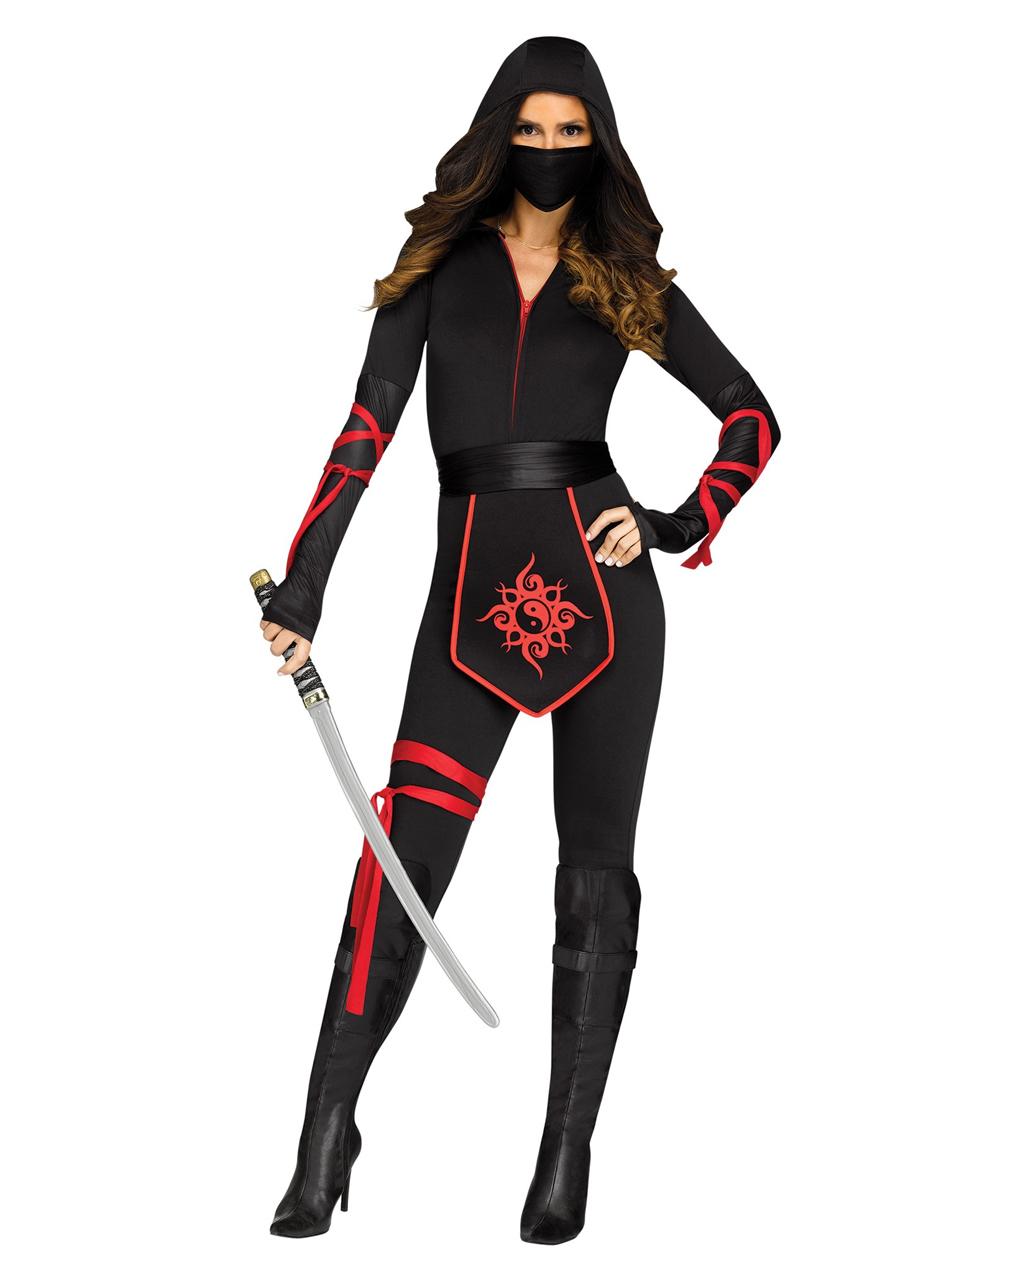 Black//Red Skull Lord Ninja Fighter Warrior Child Costume